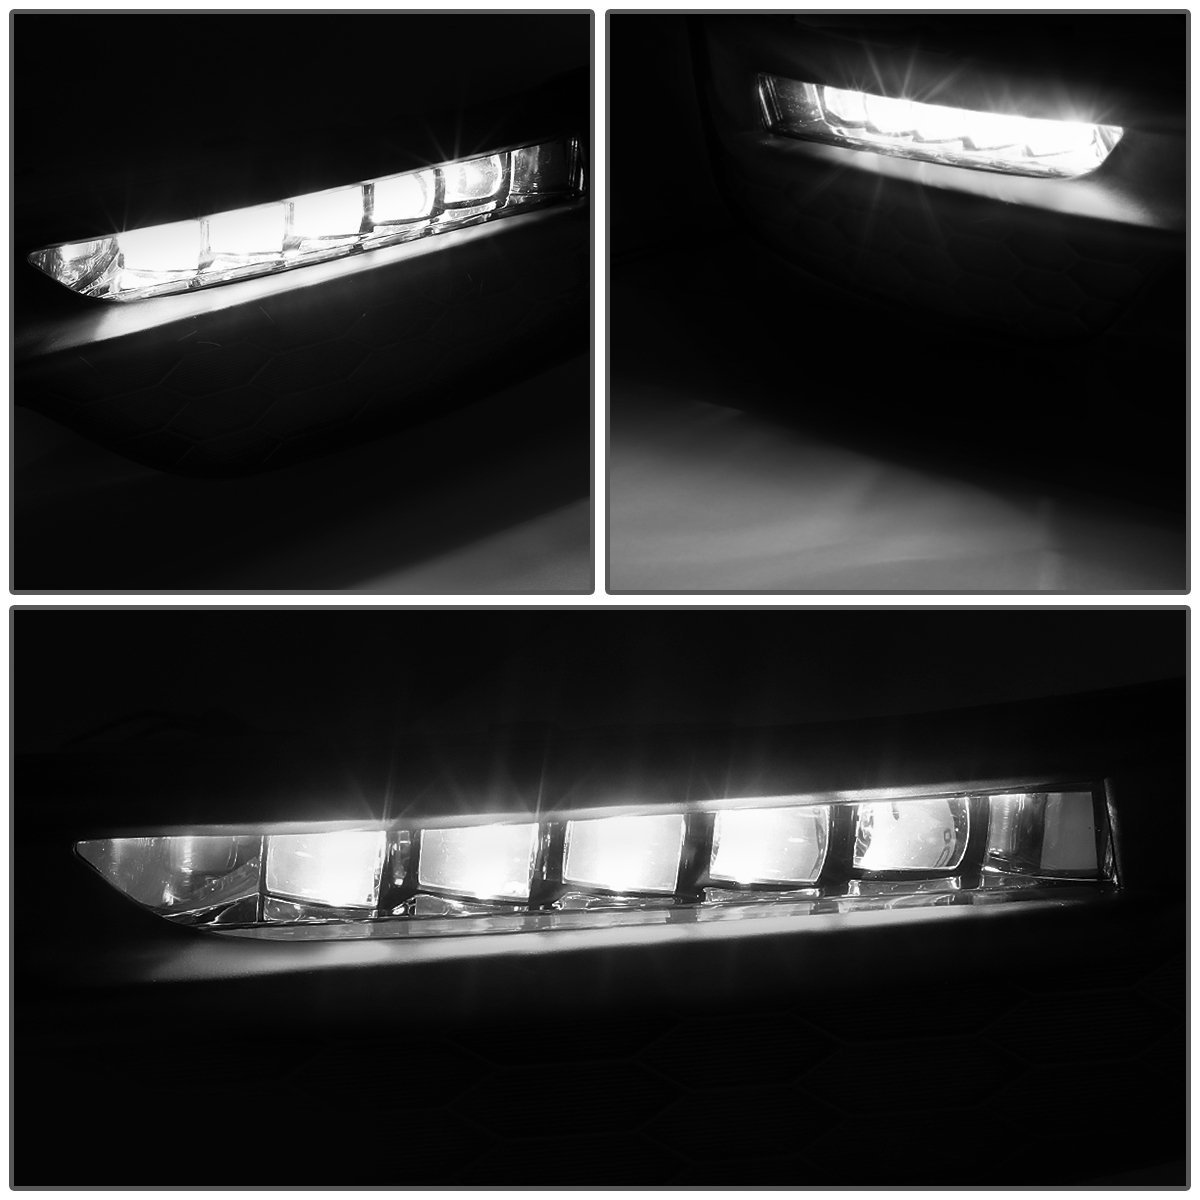 Bezels Switch 16-17 Honda Accord DNA Motoring FL-ZTL-257-AM Pair of Amber Lens LED Fog Light